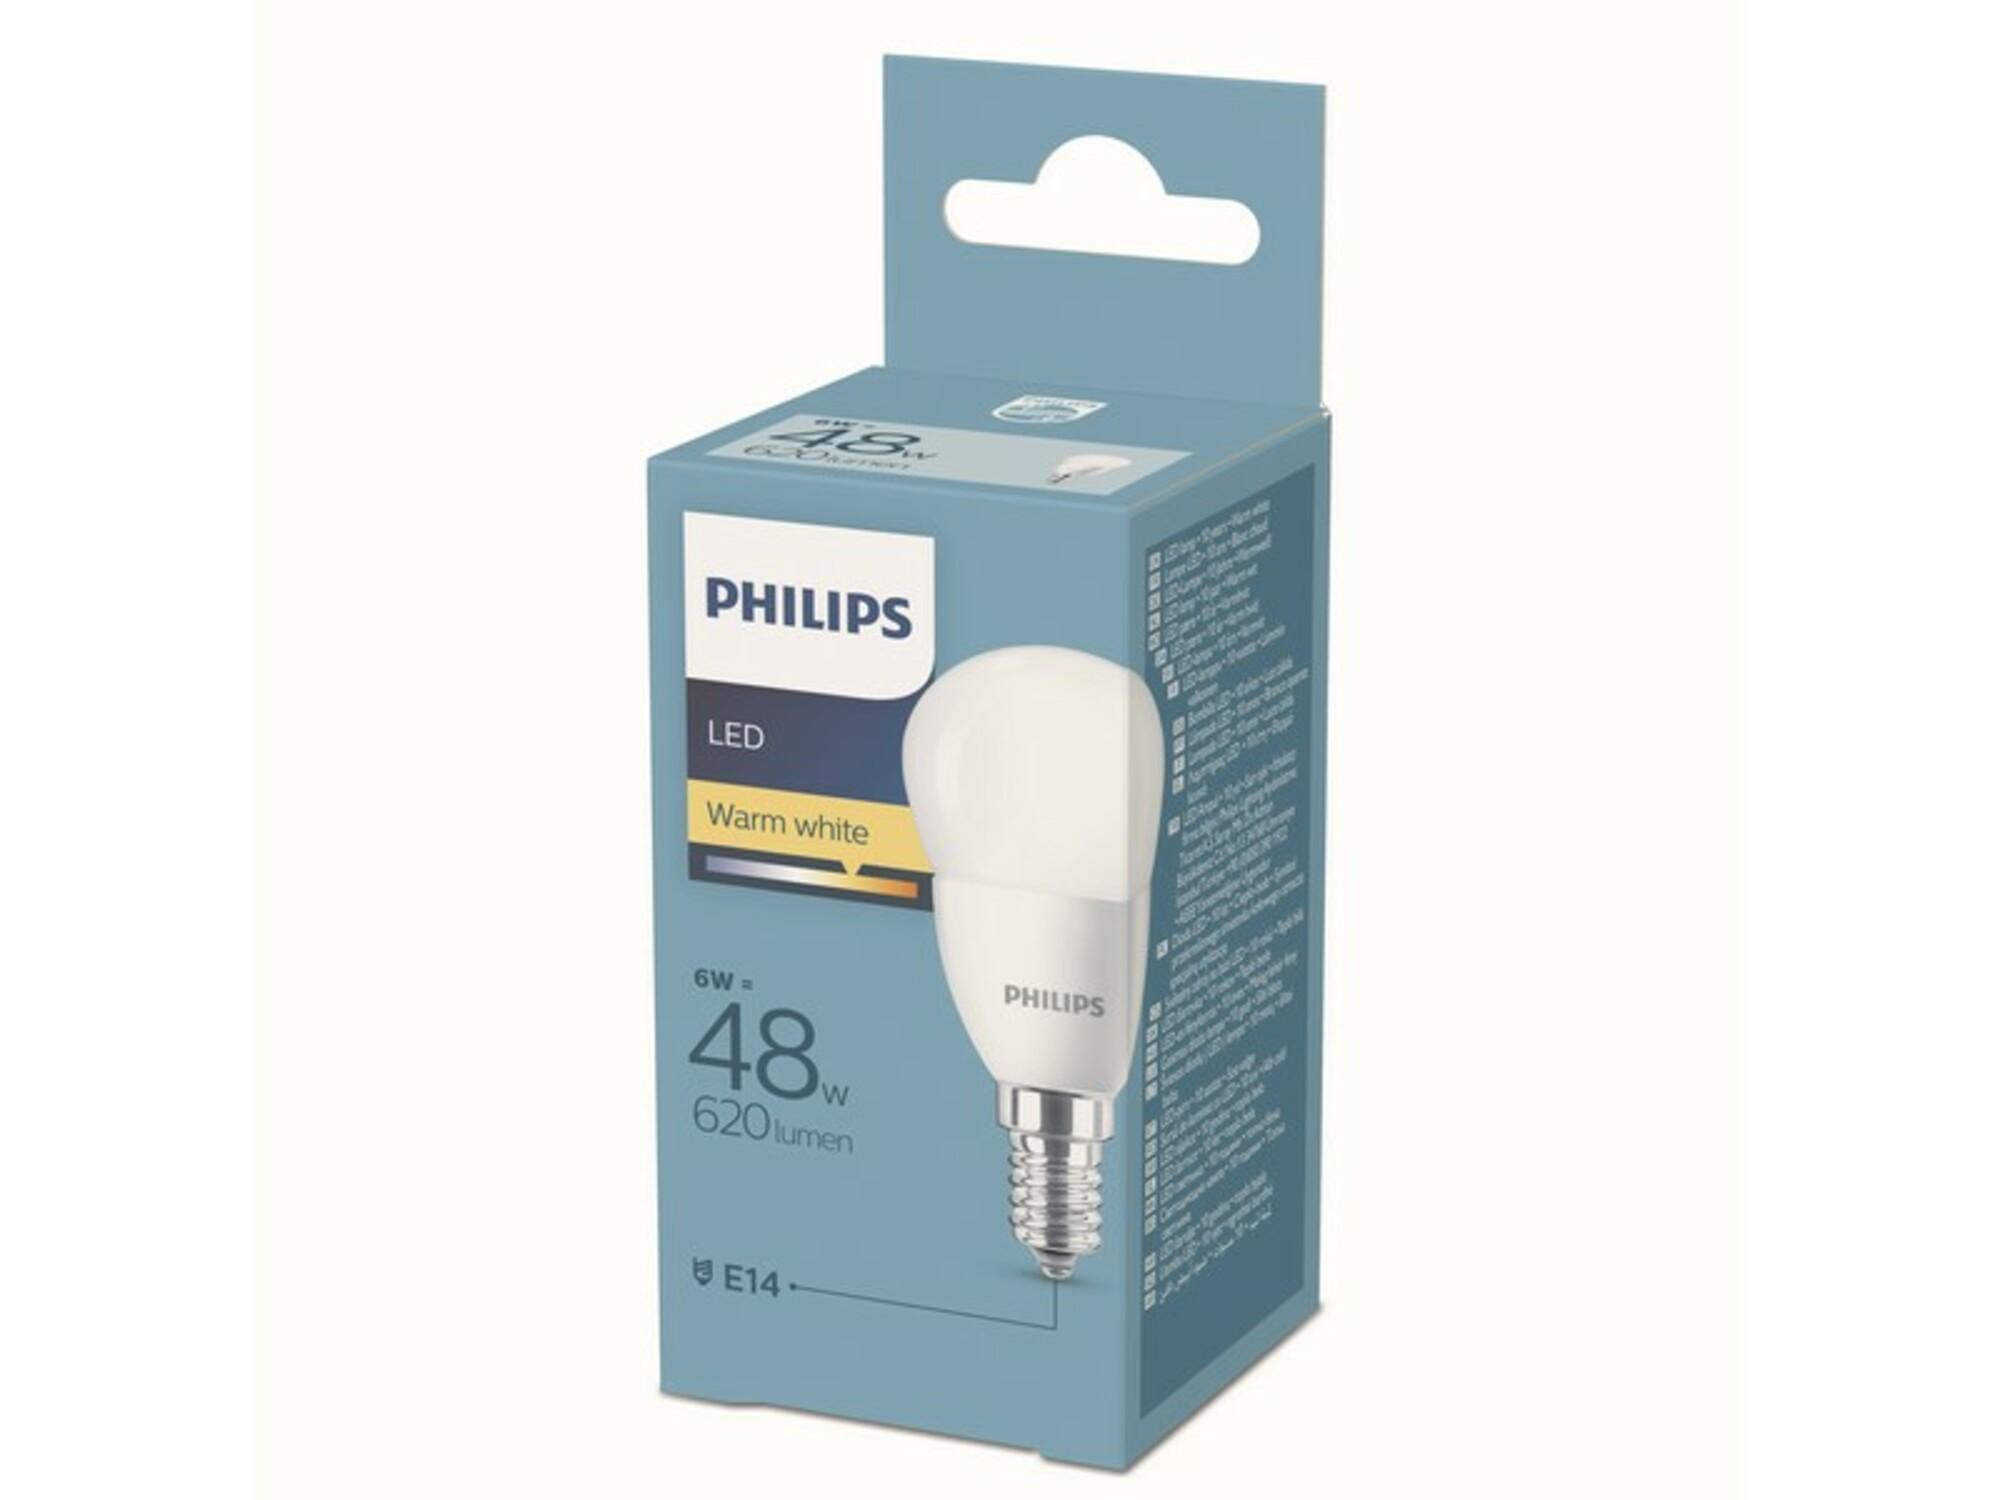 Philips Led Sijalica, Grlo E14 P45, Snaga 6W (48W) Ps672